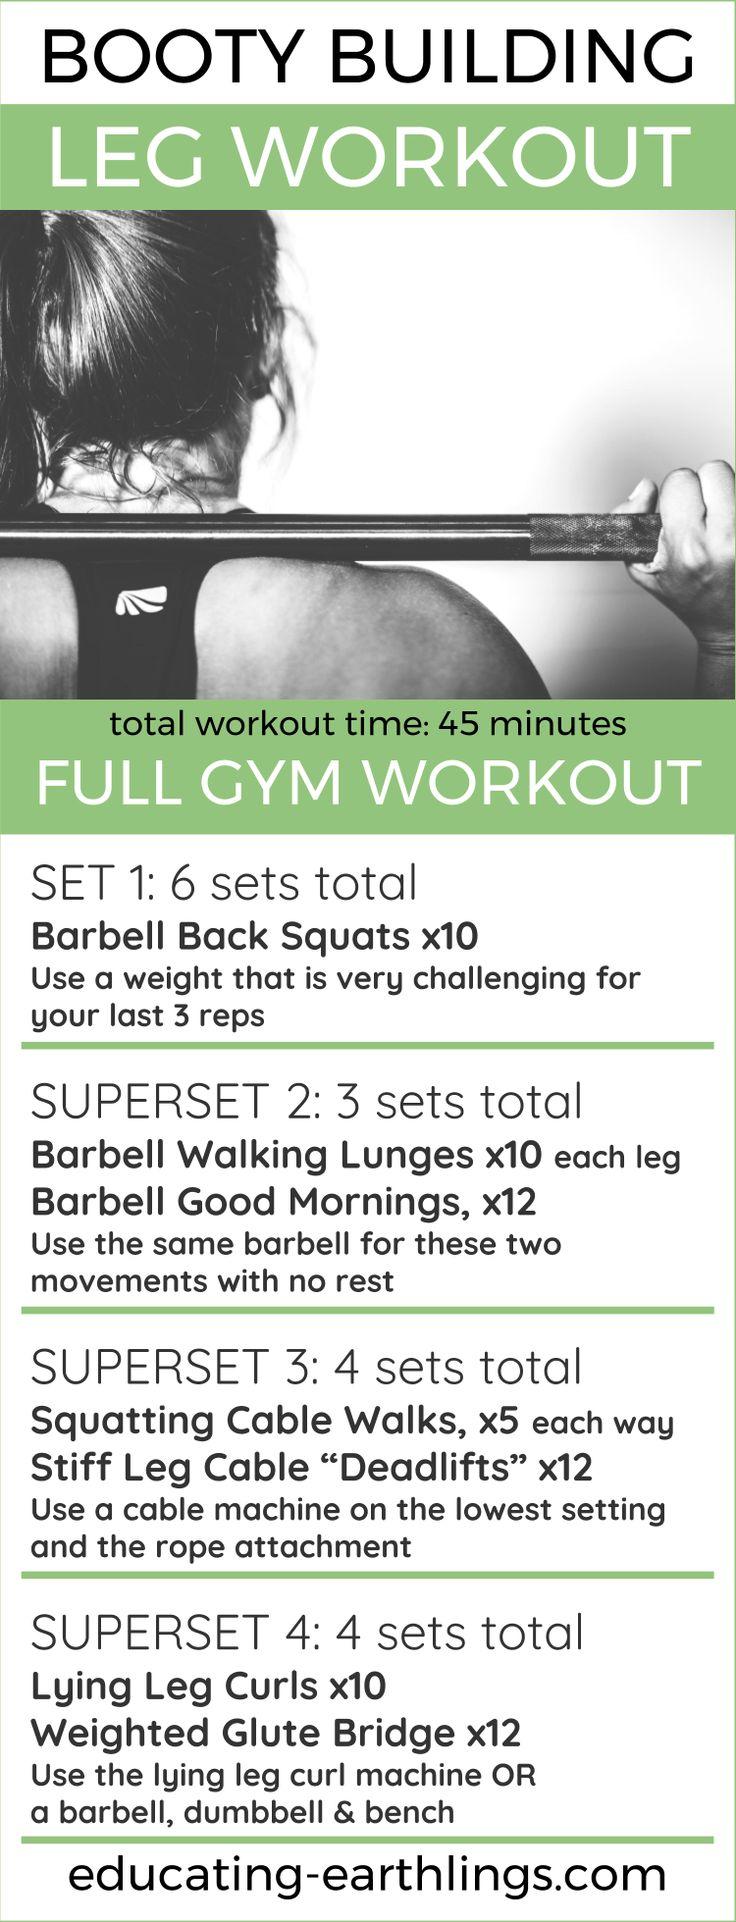 Booty Building Leg Workout-8436